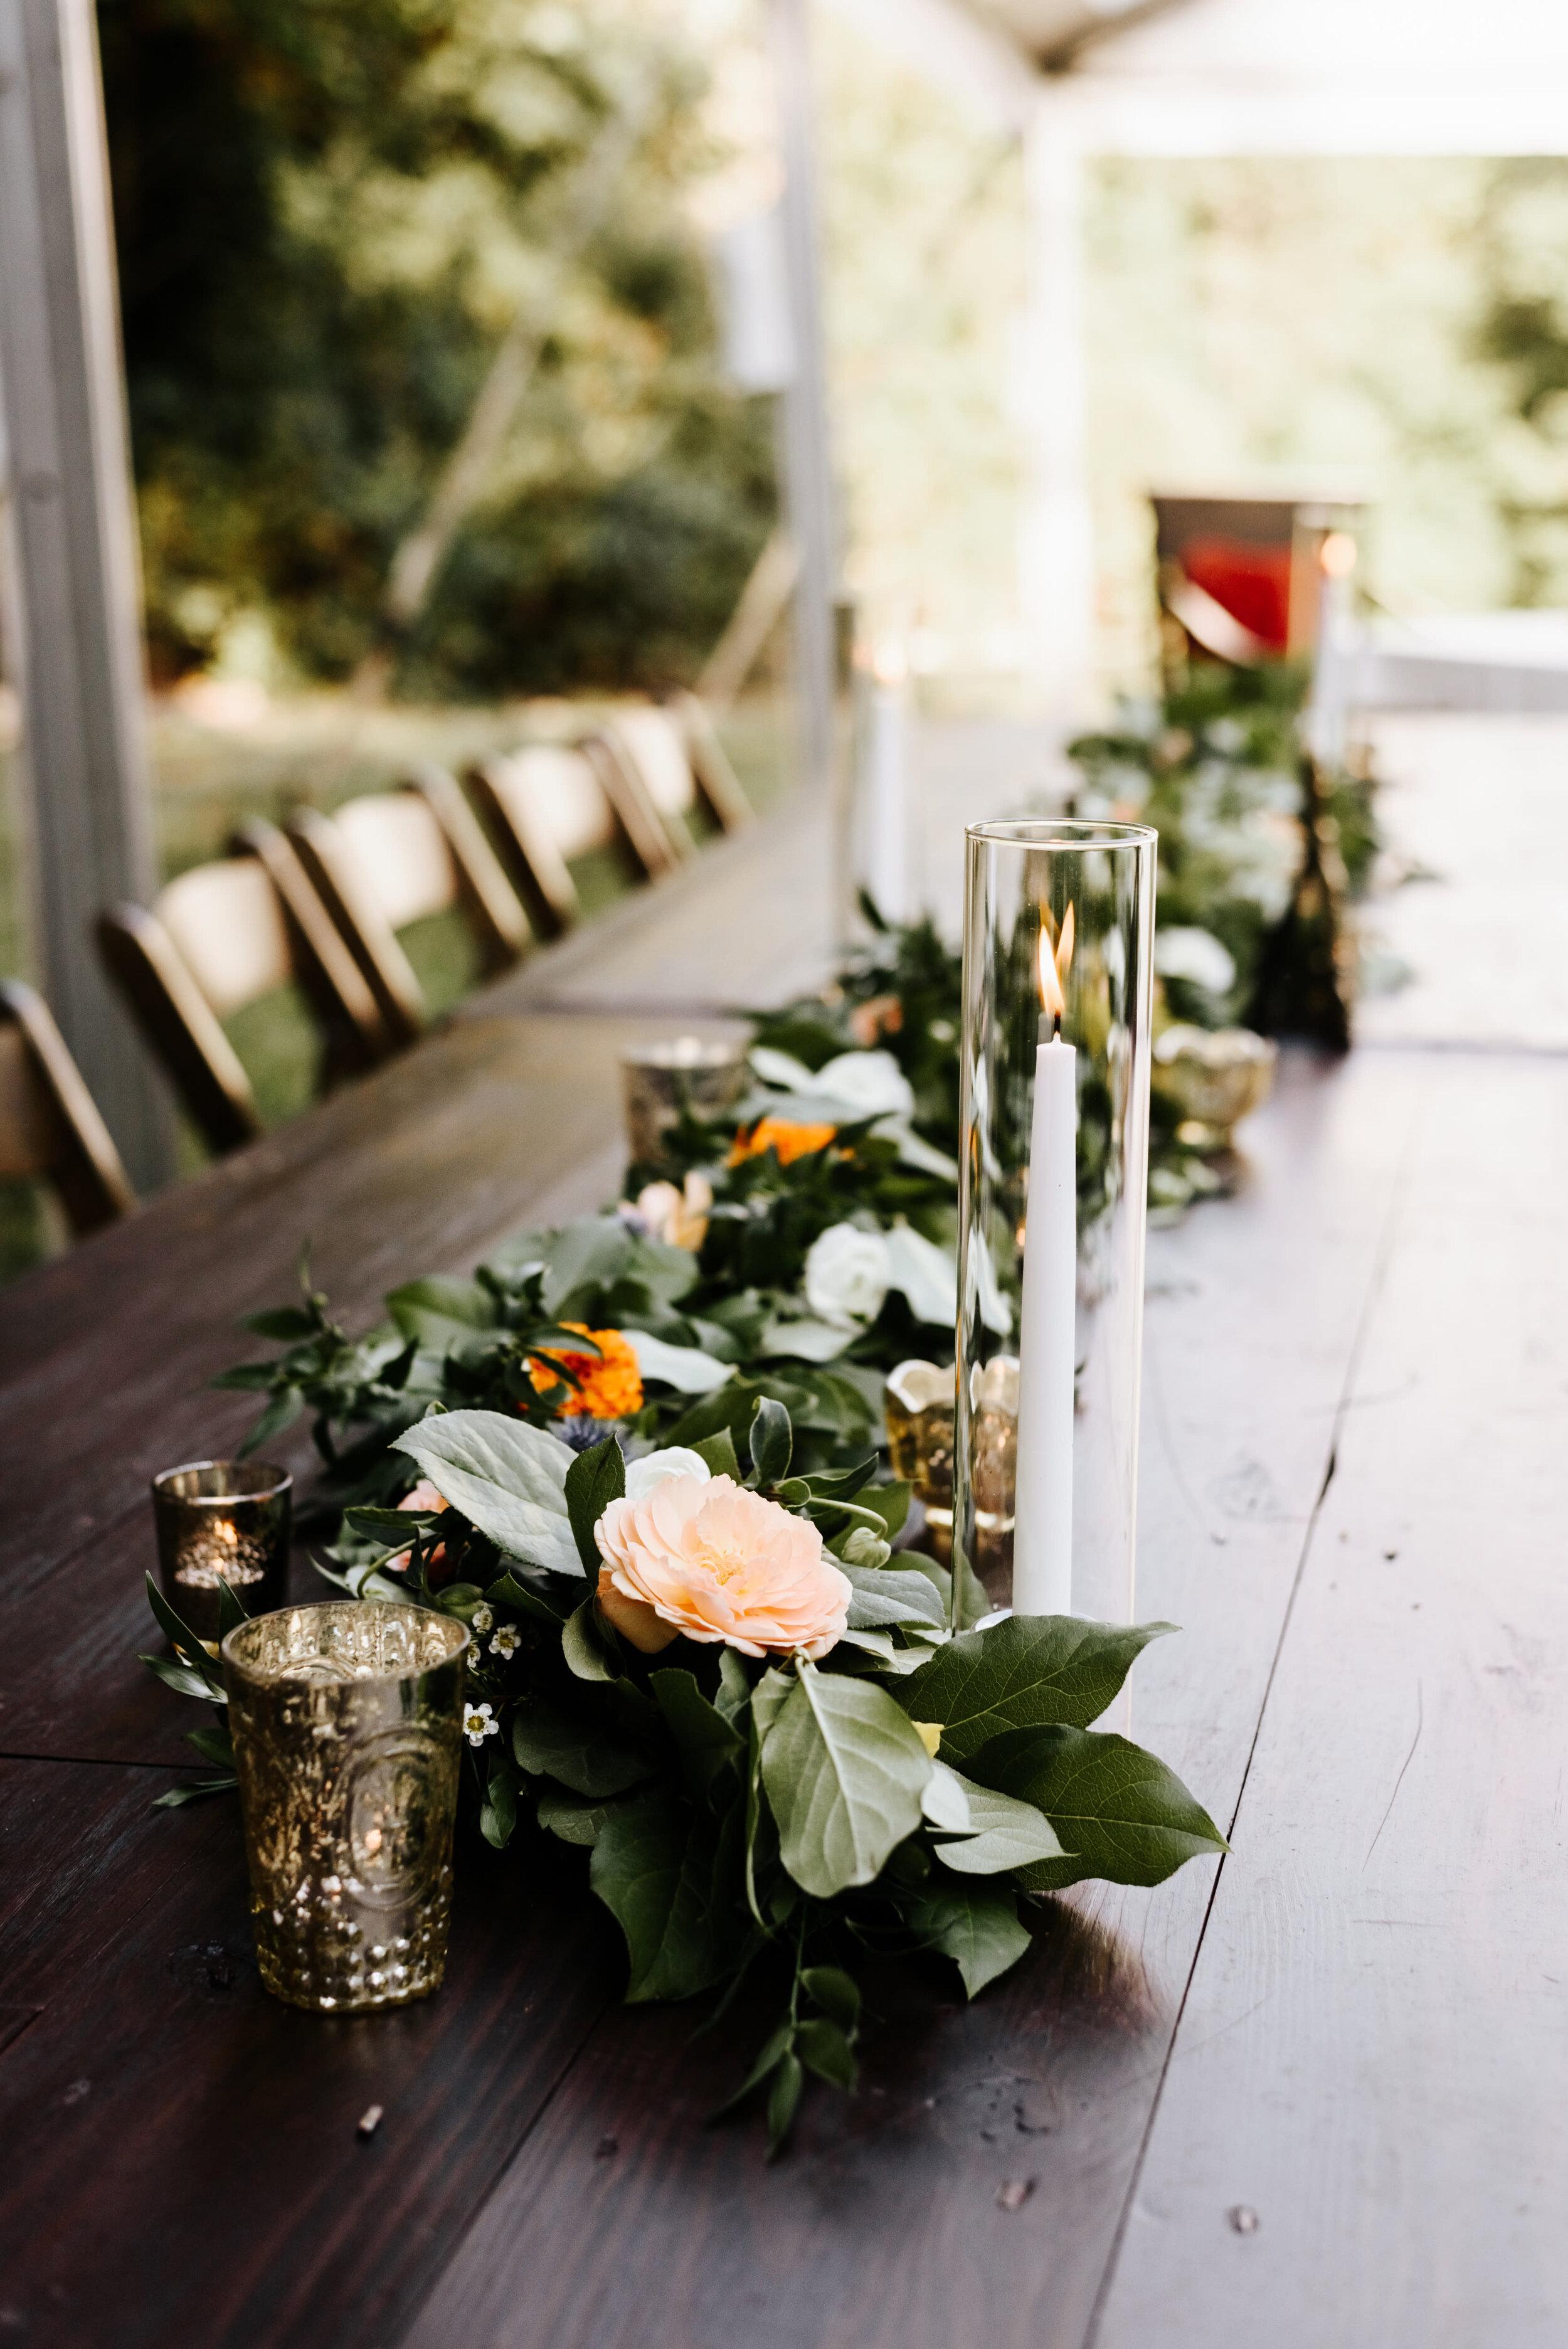 Rachel_David_Wedding_Richmond_Virginia_Photography_by_V_100.jpg